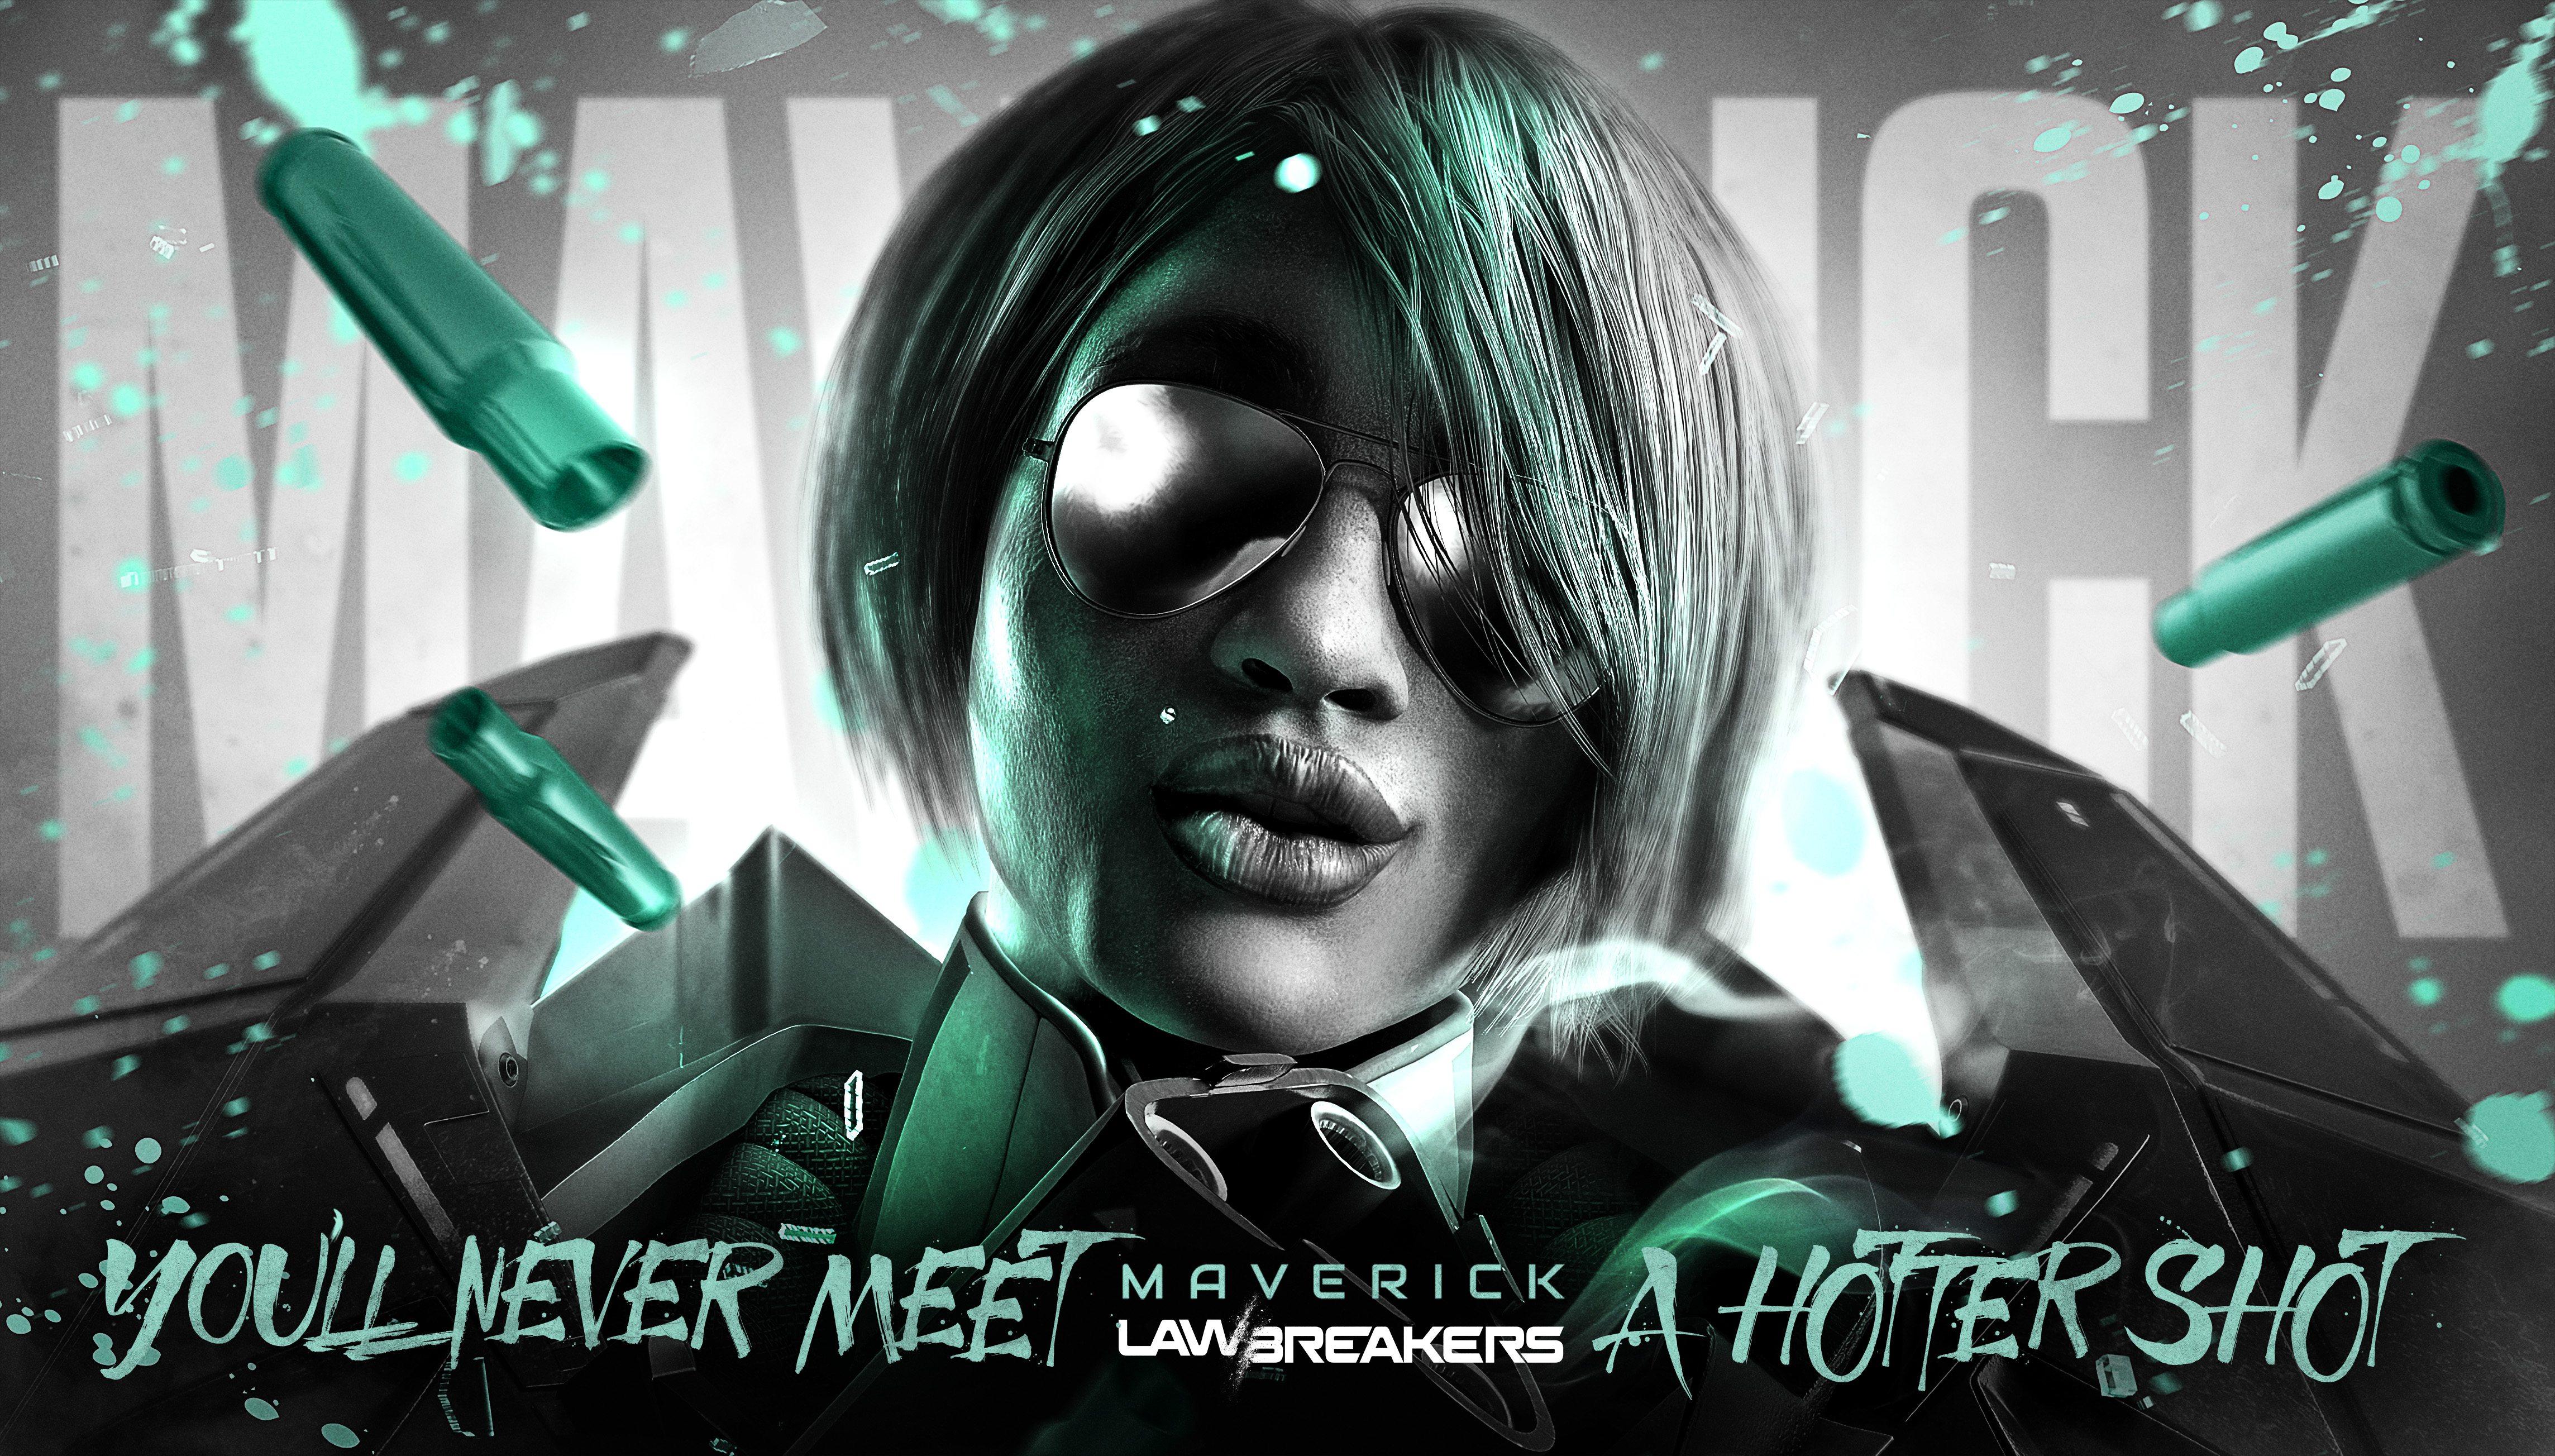 LawBreakers Releases Vanguard Video